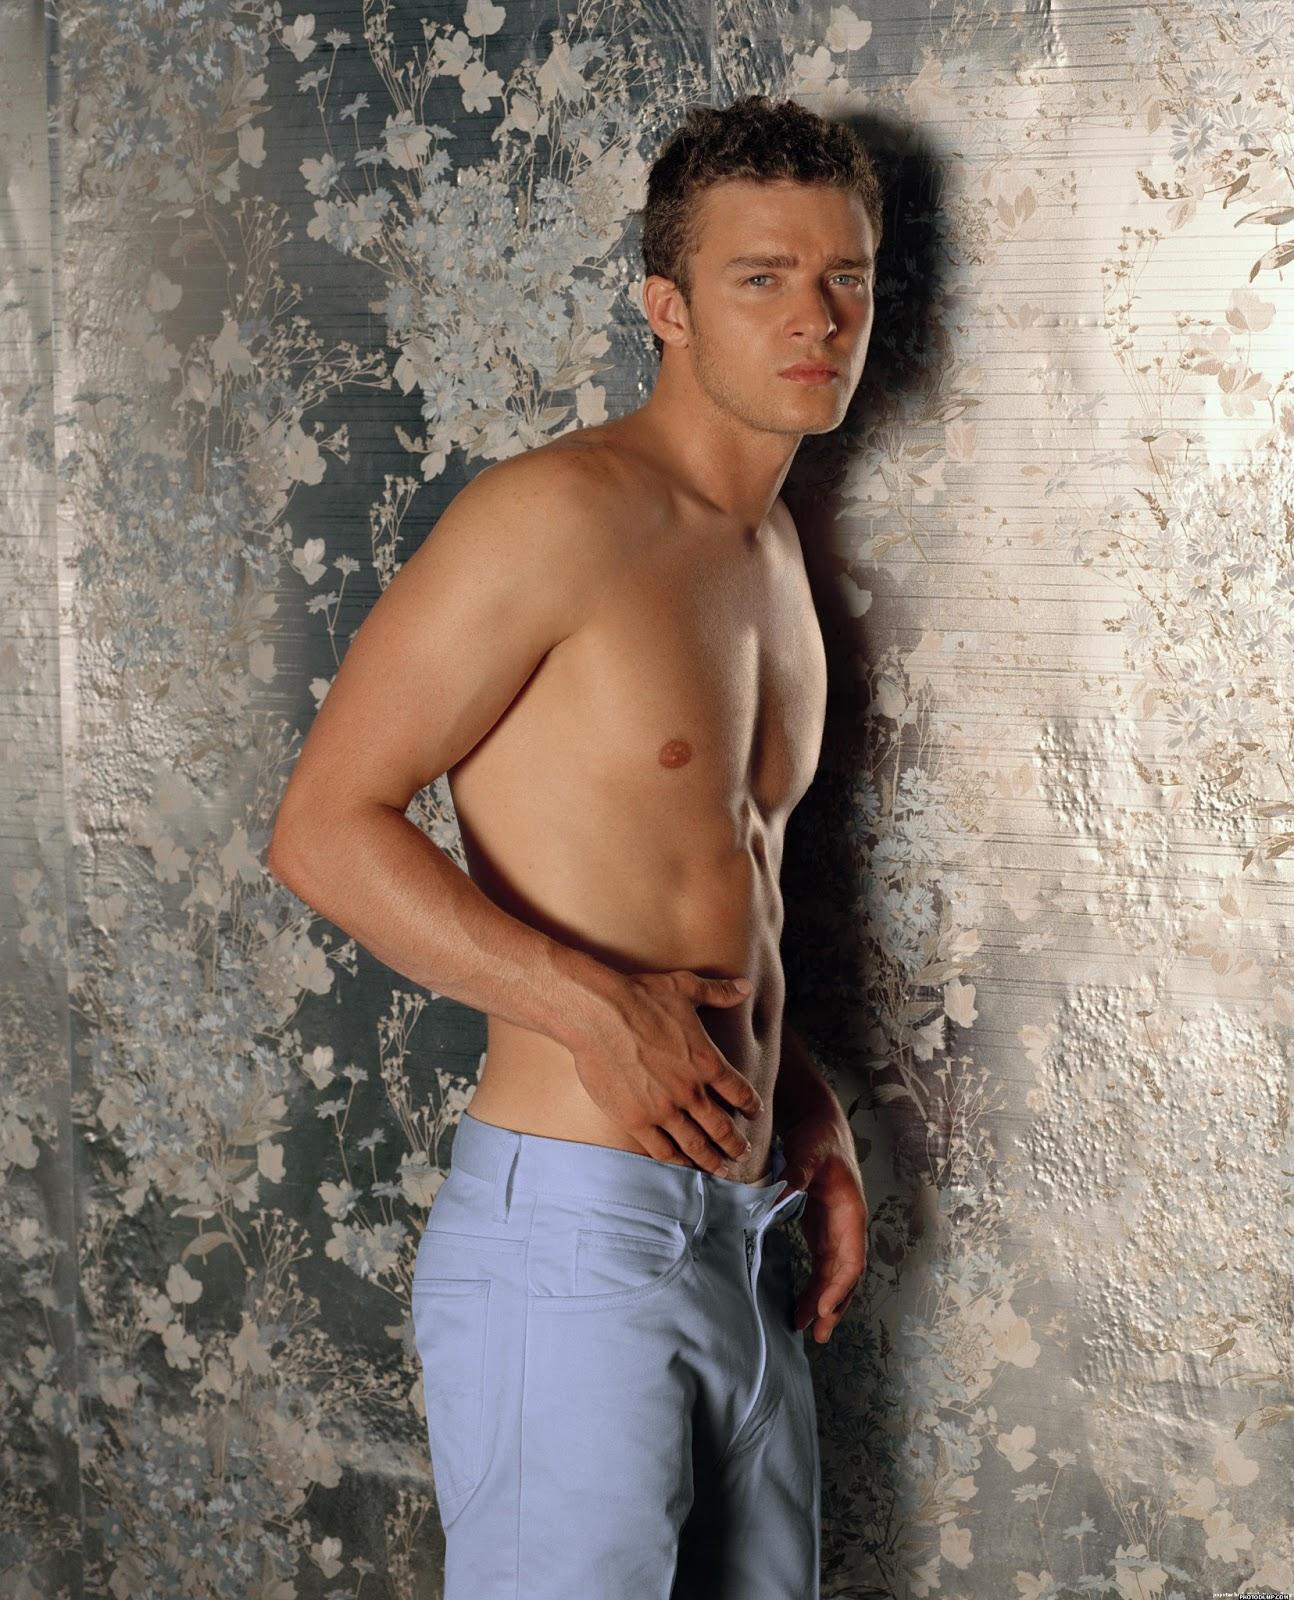 http://3.bp.blogspot.com/-1tgPqH_31SI/UPLfNzORm9I/AAAAAAAAeYA/AhiLUtJpe8A/s1600/Justin-Timberlake-Shirtless-08.jpg